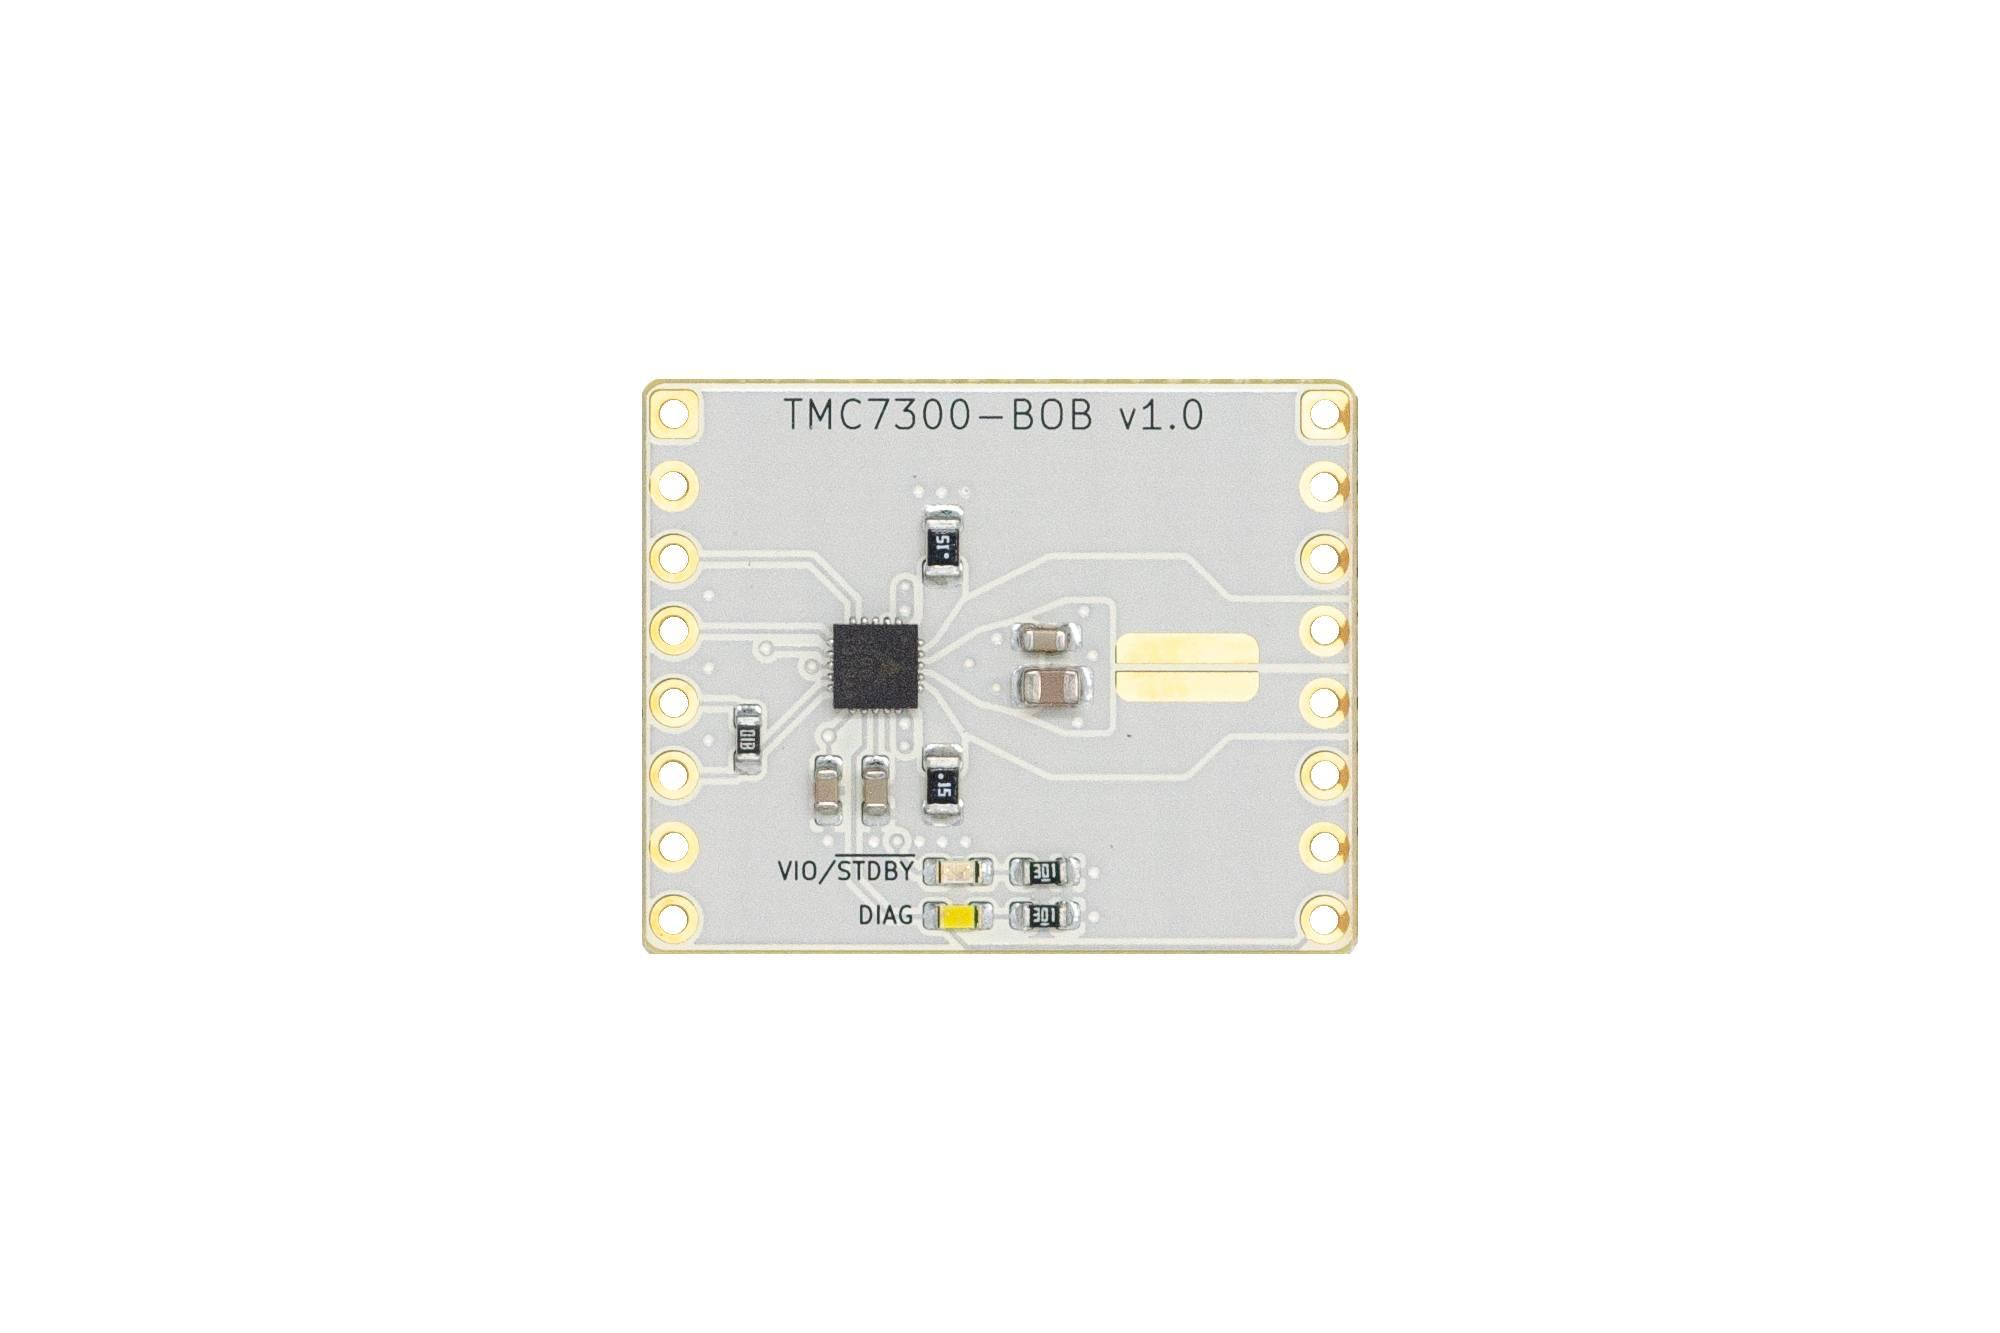 TMC7300-BOB